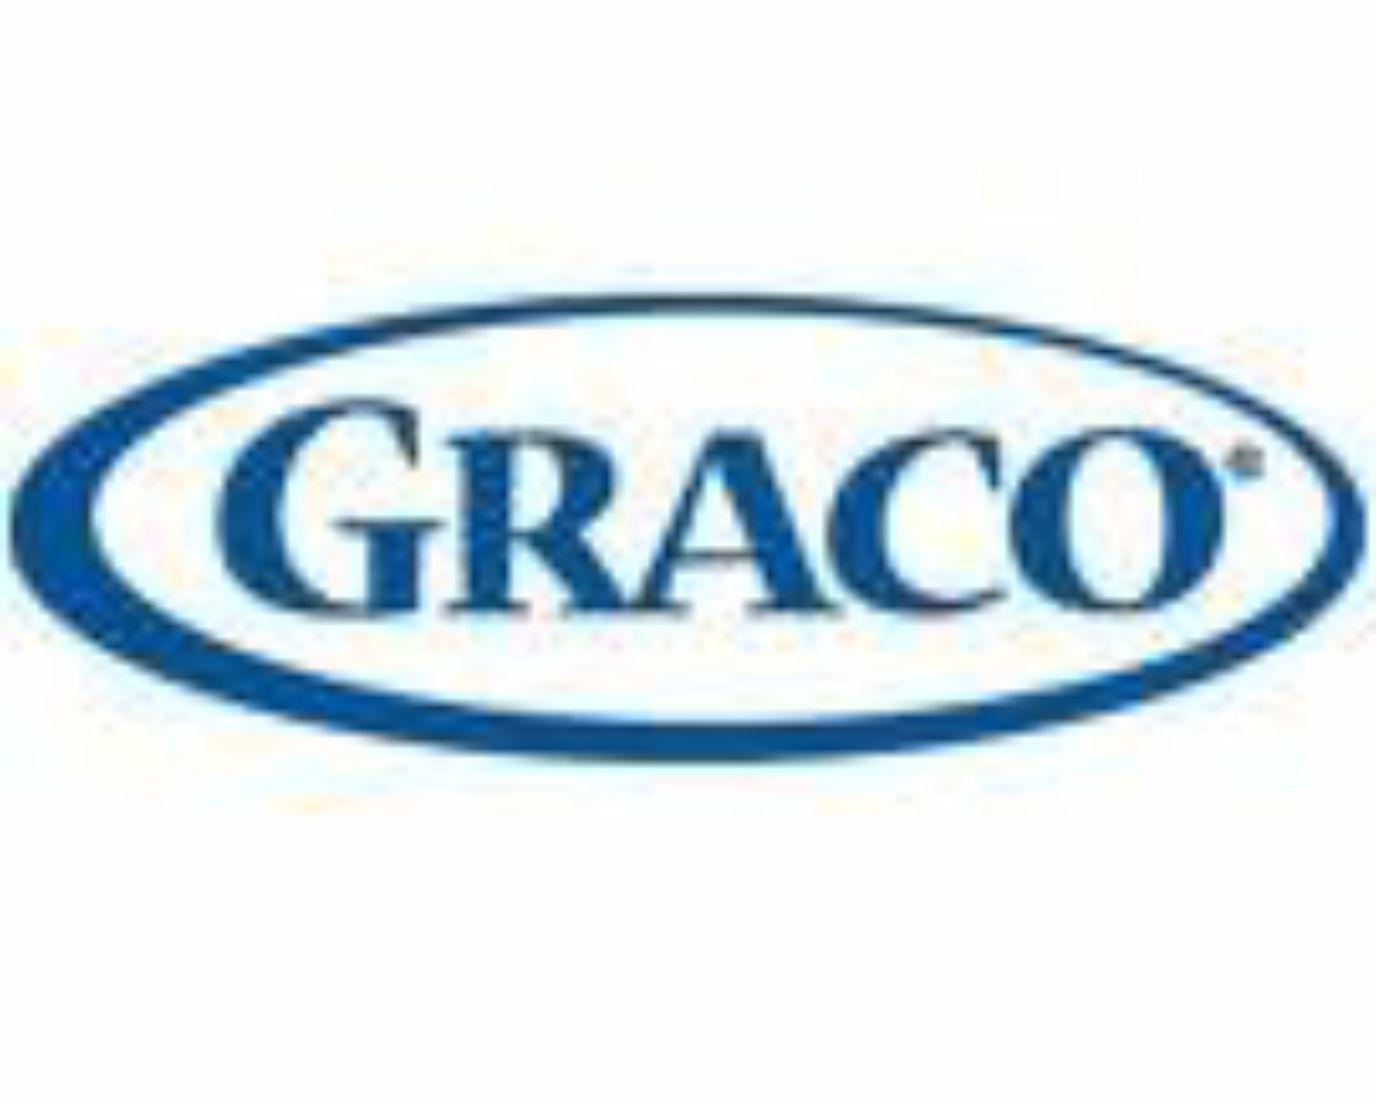 travel cot mattress to fit Graco® Boston check travel cot ...